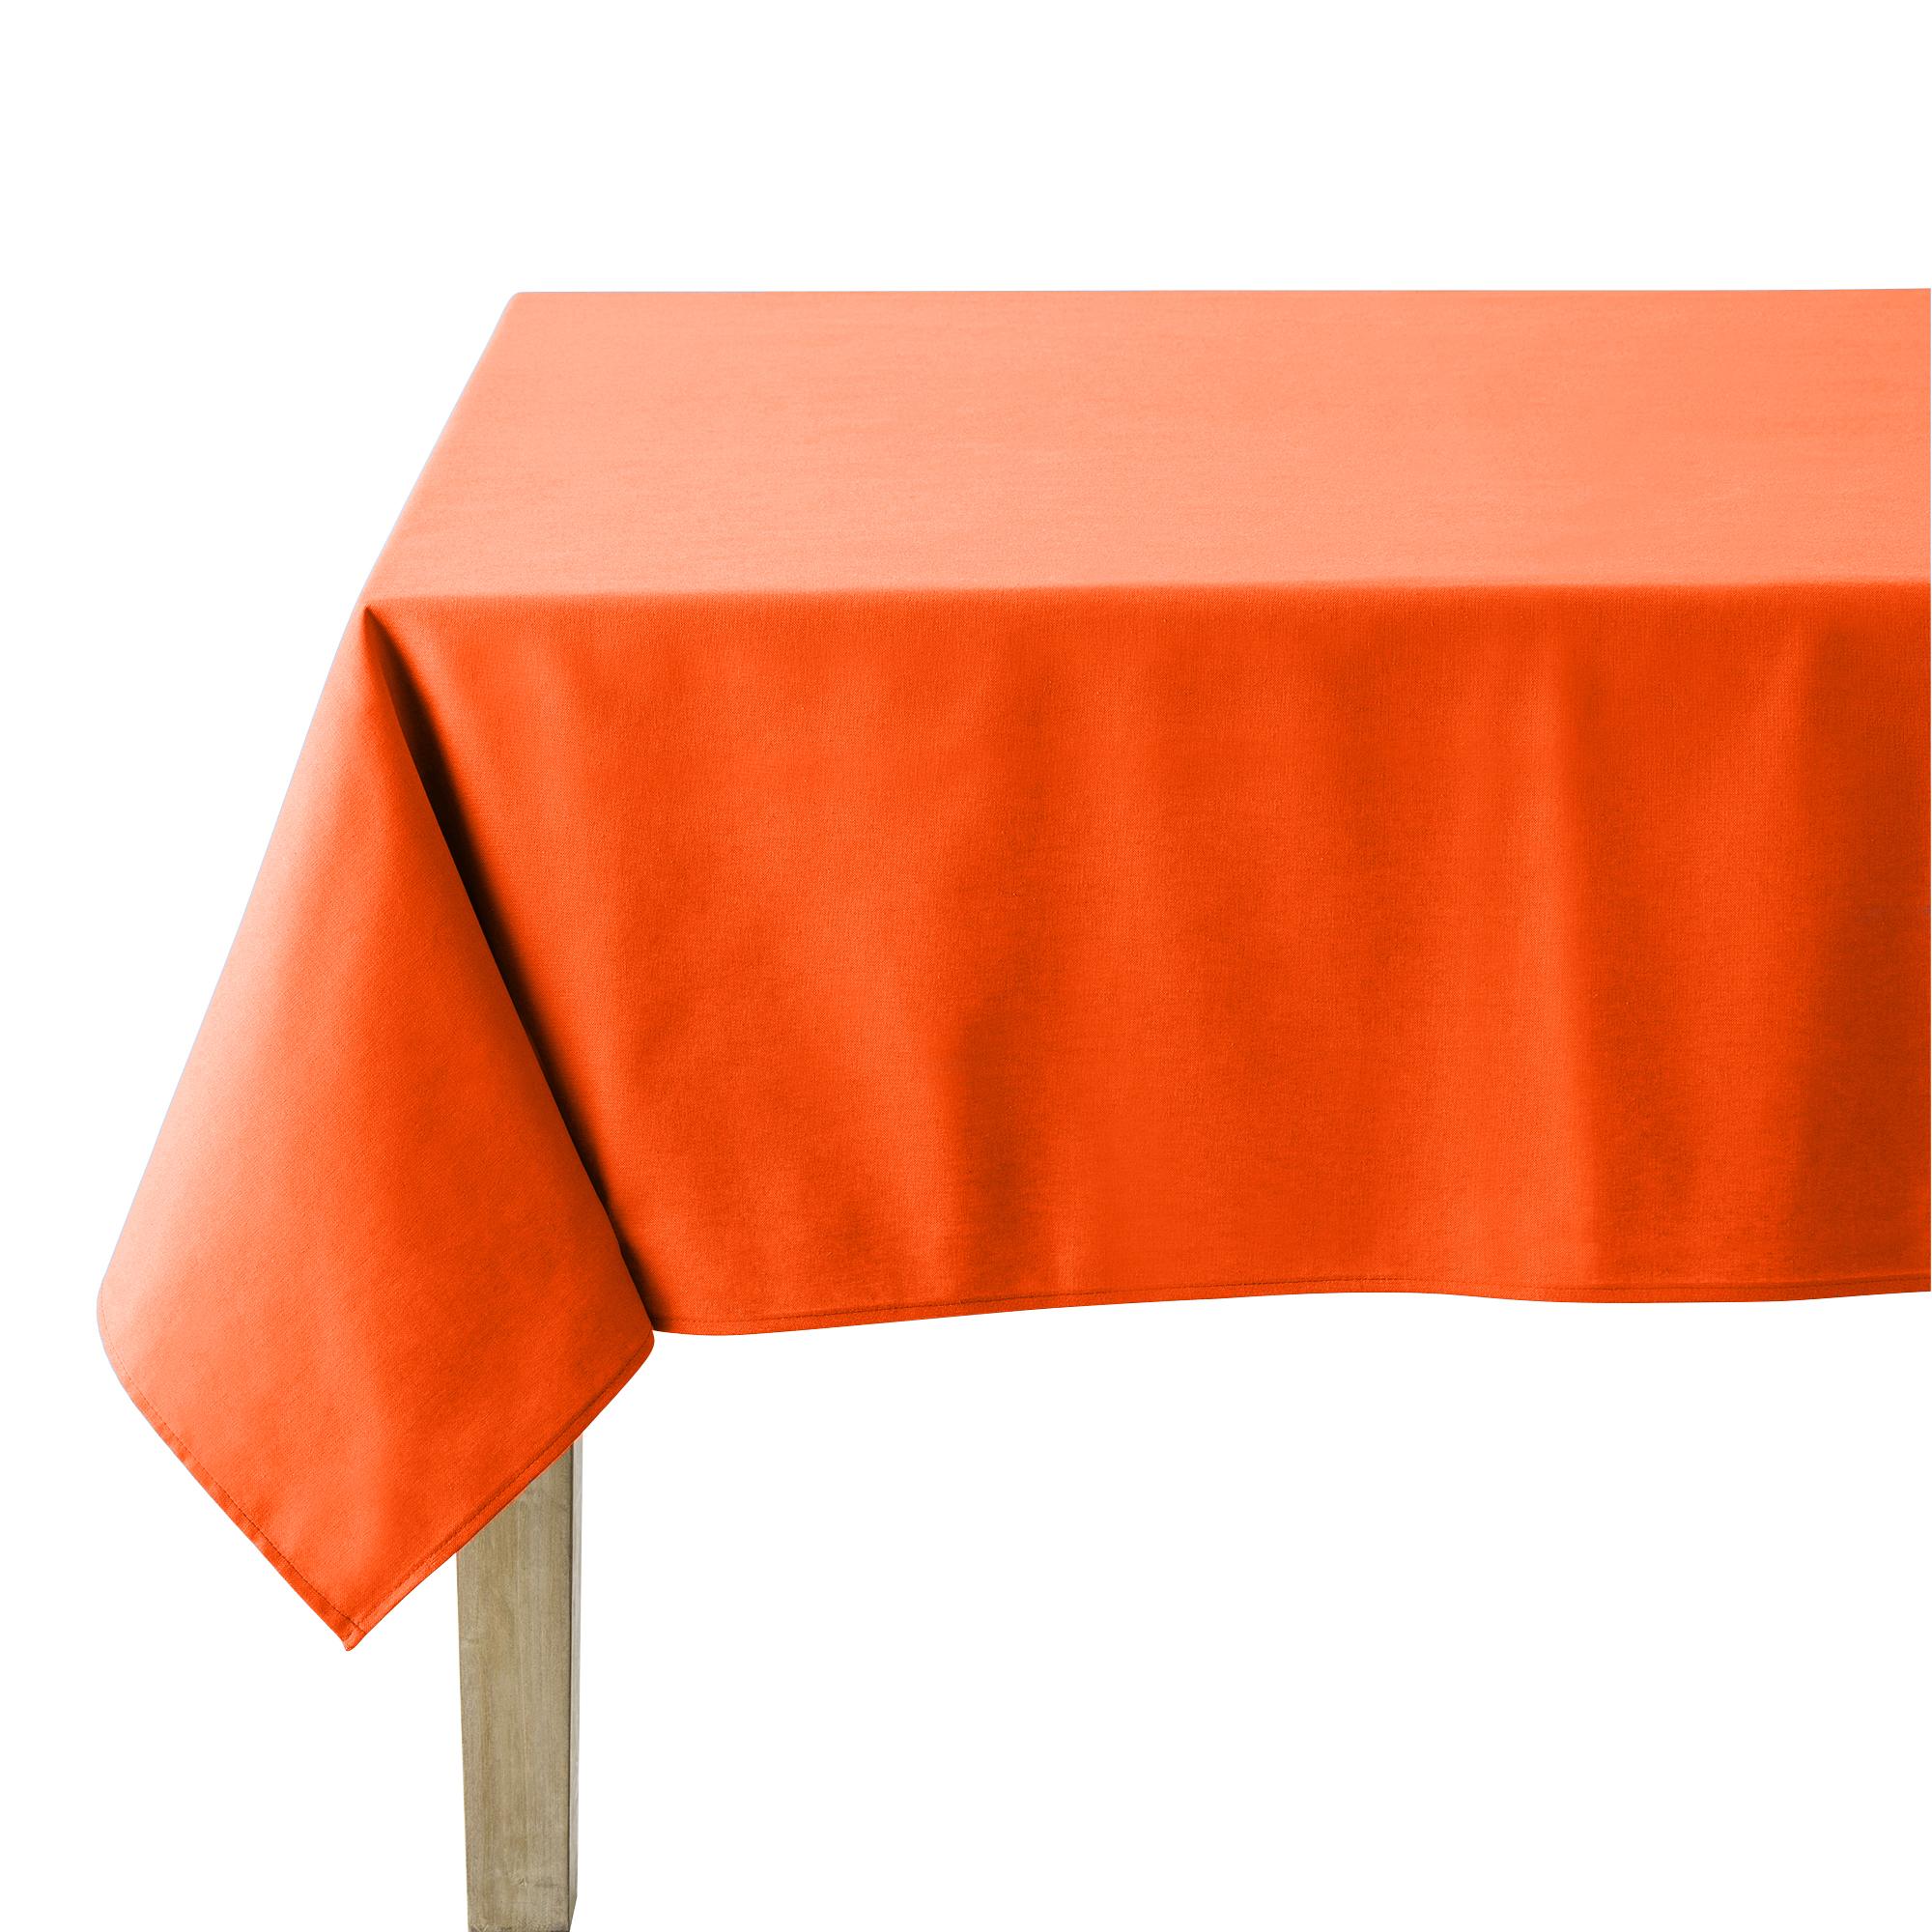 Nappe en coton traitee teflon mandarine 180 x 300